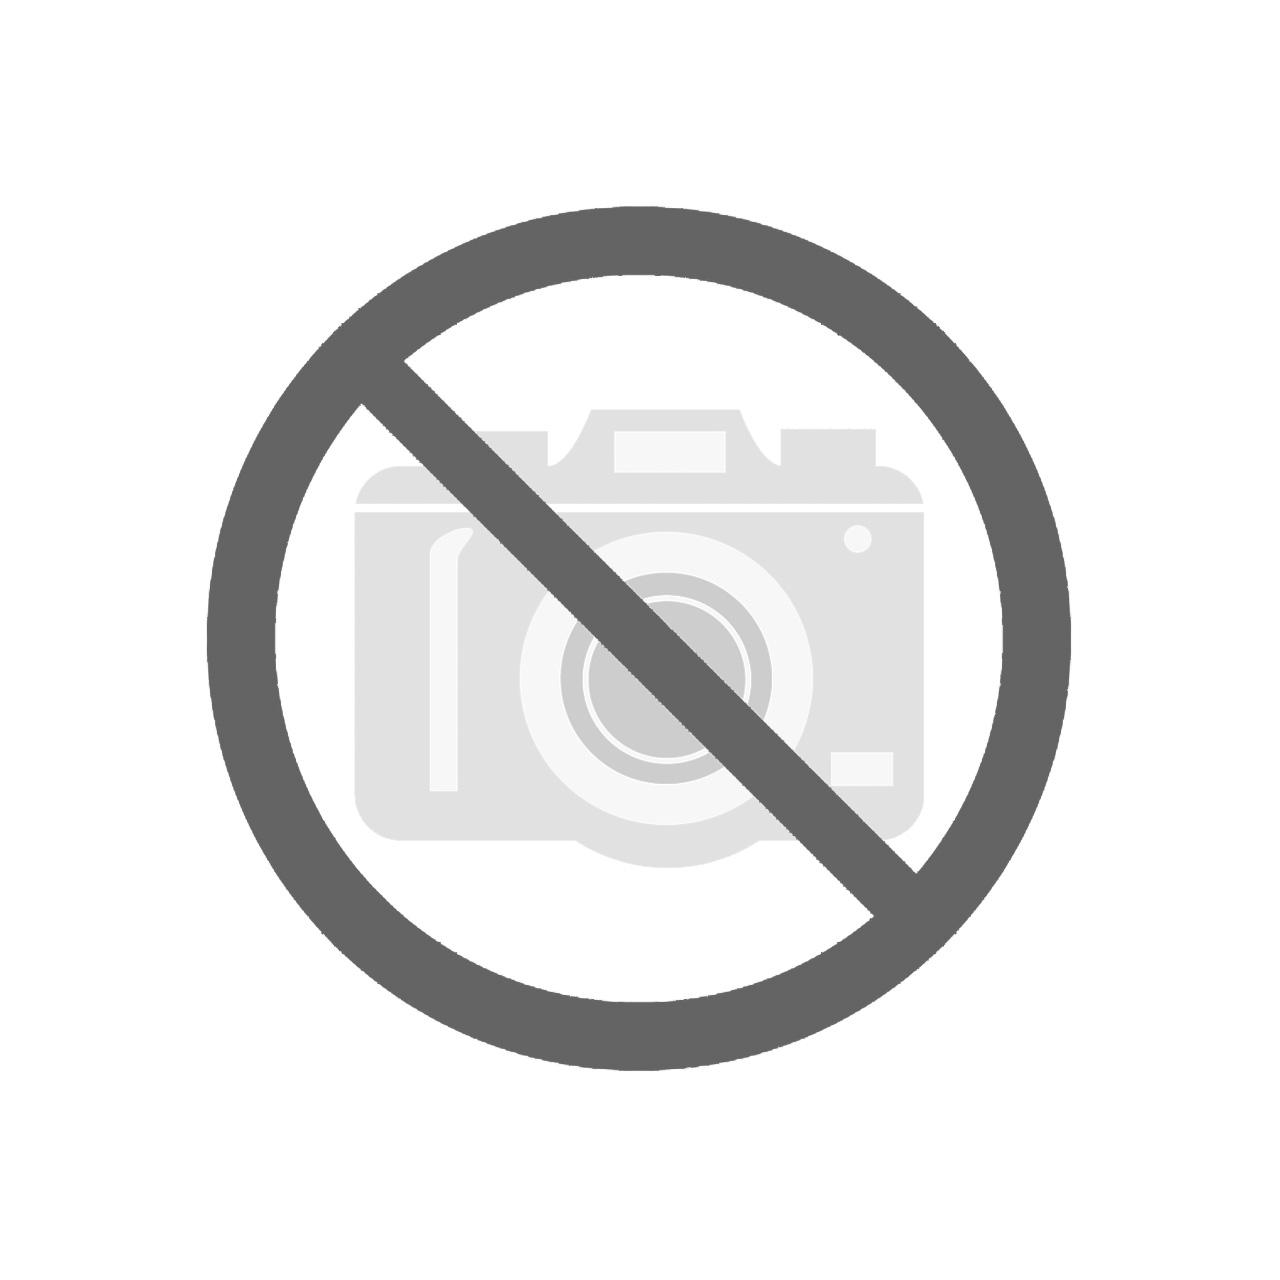 Transporter wiórów do MSB 560 V BERNARDO